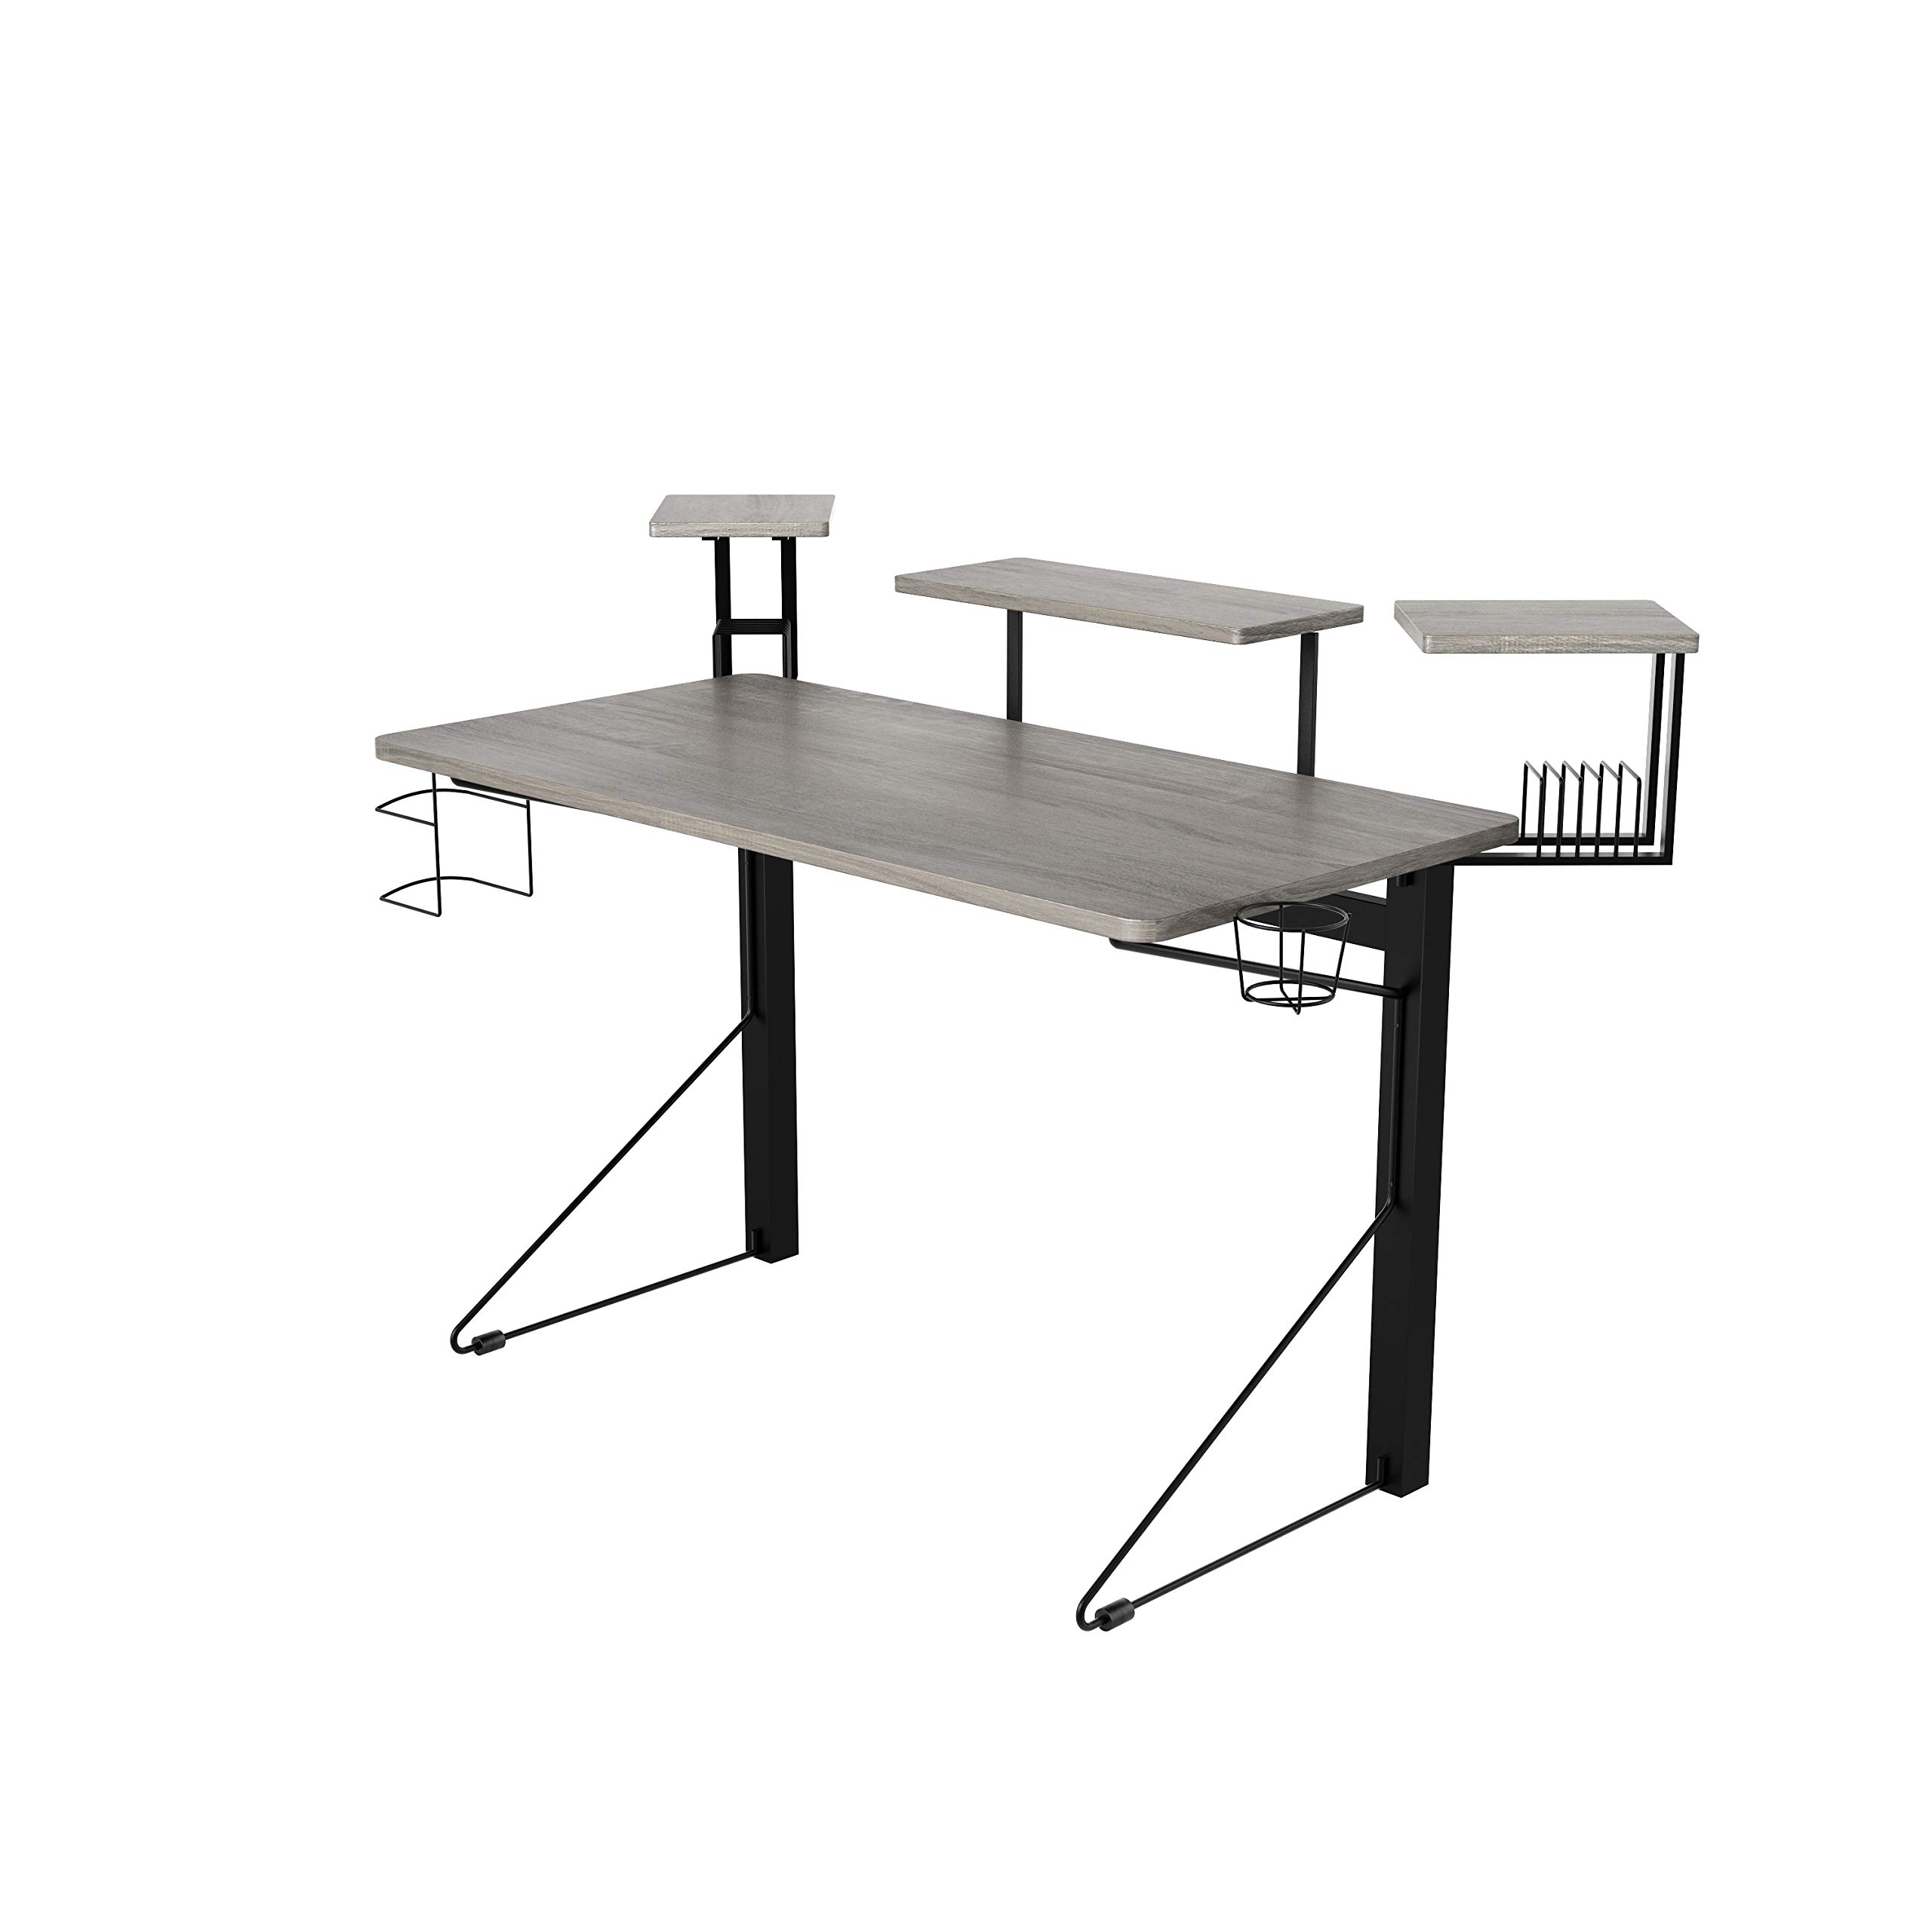 DAR JCDES777 CORE Computer Gaming Desk, Standard, Gray/Black by Dar